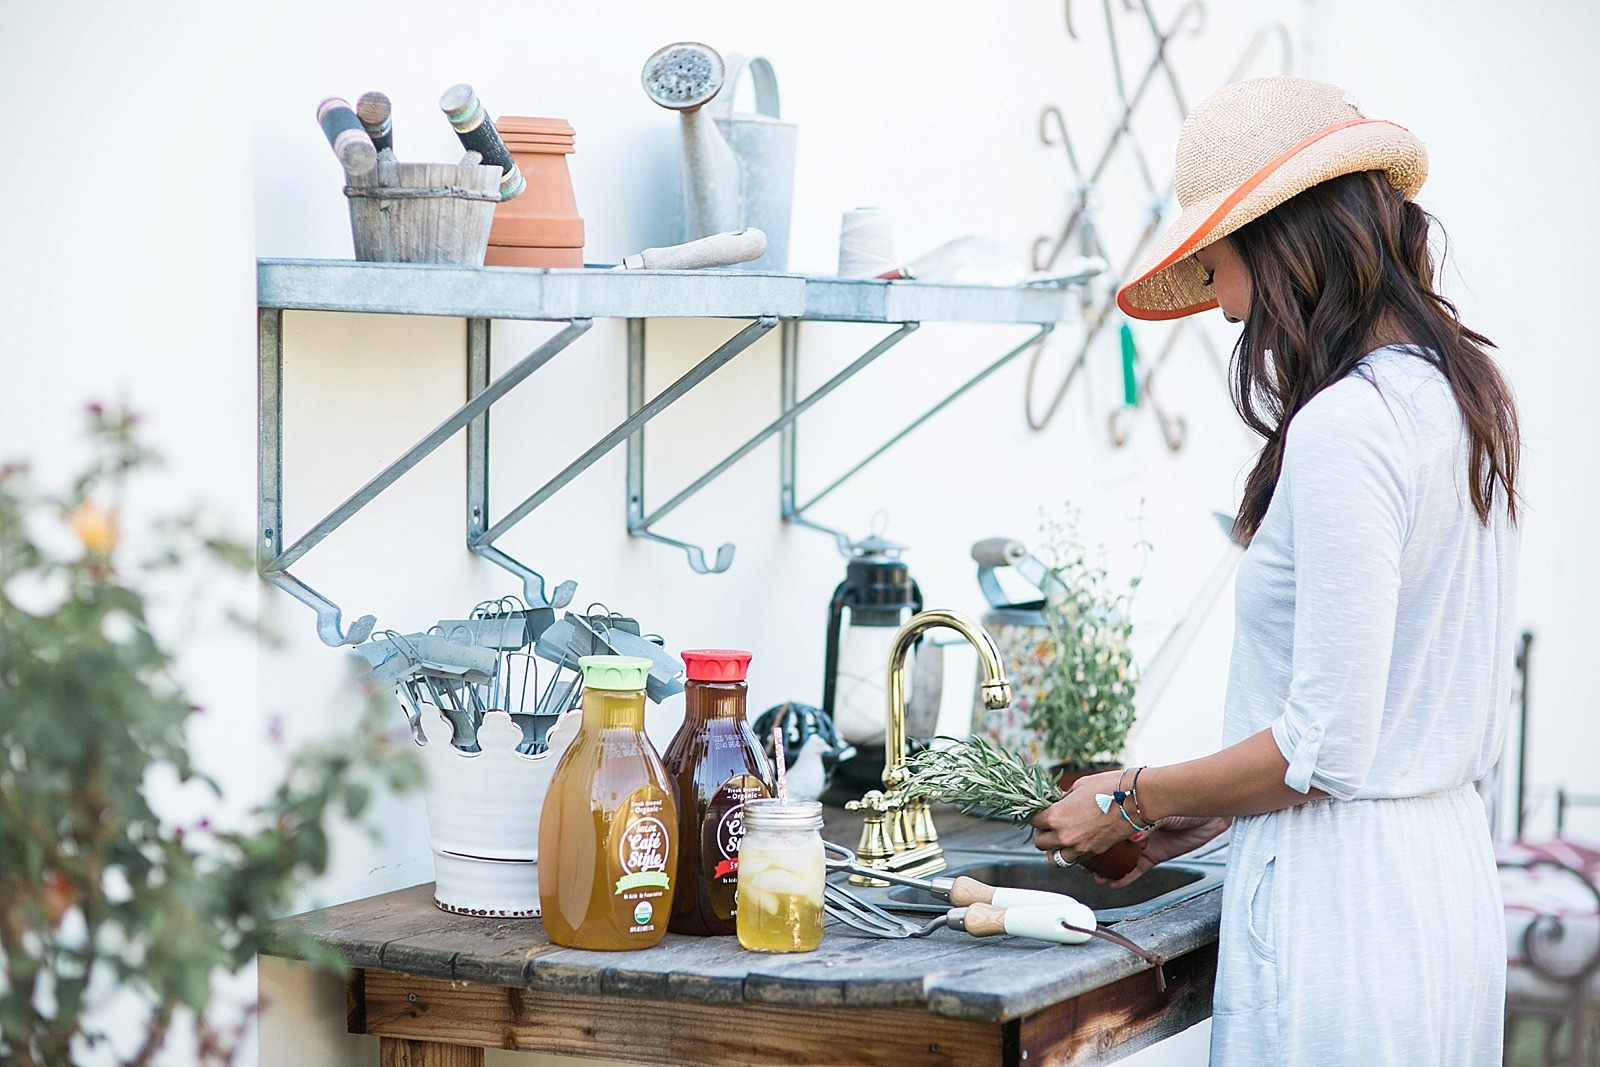 milo-iced-tea-gardening-lifestyle-blogger-diana-elizabeth-blog_0048